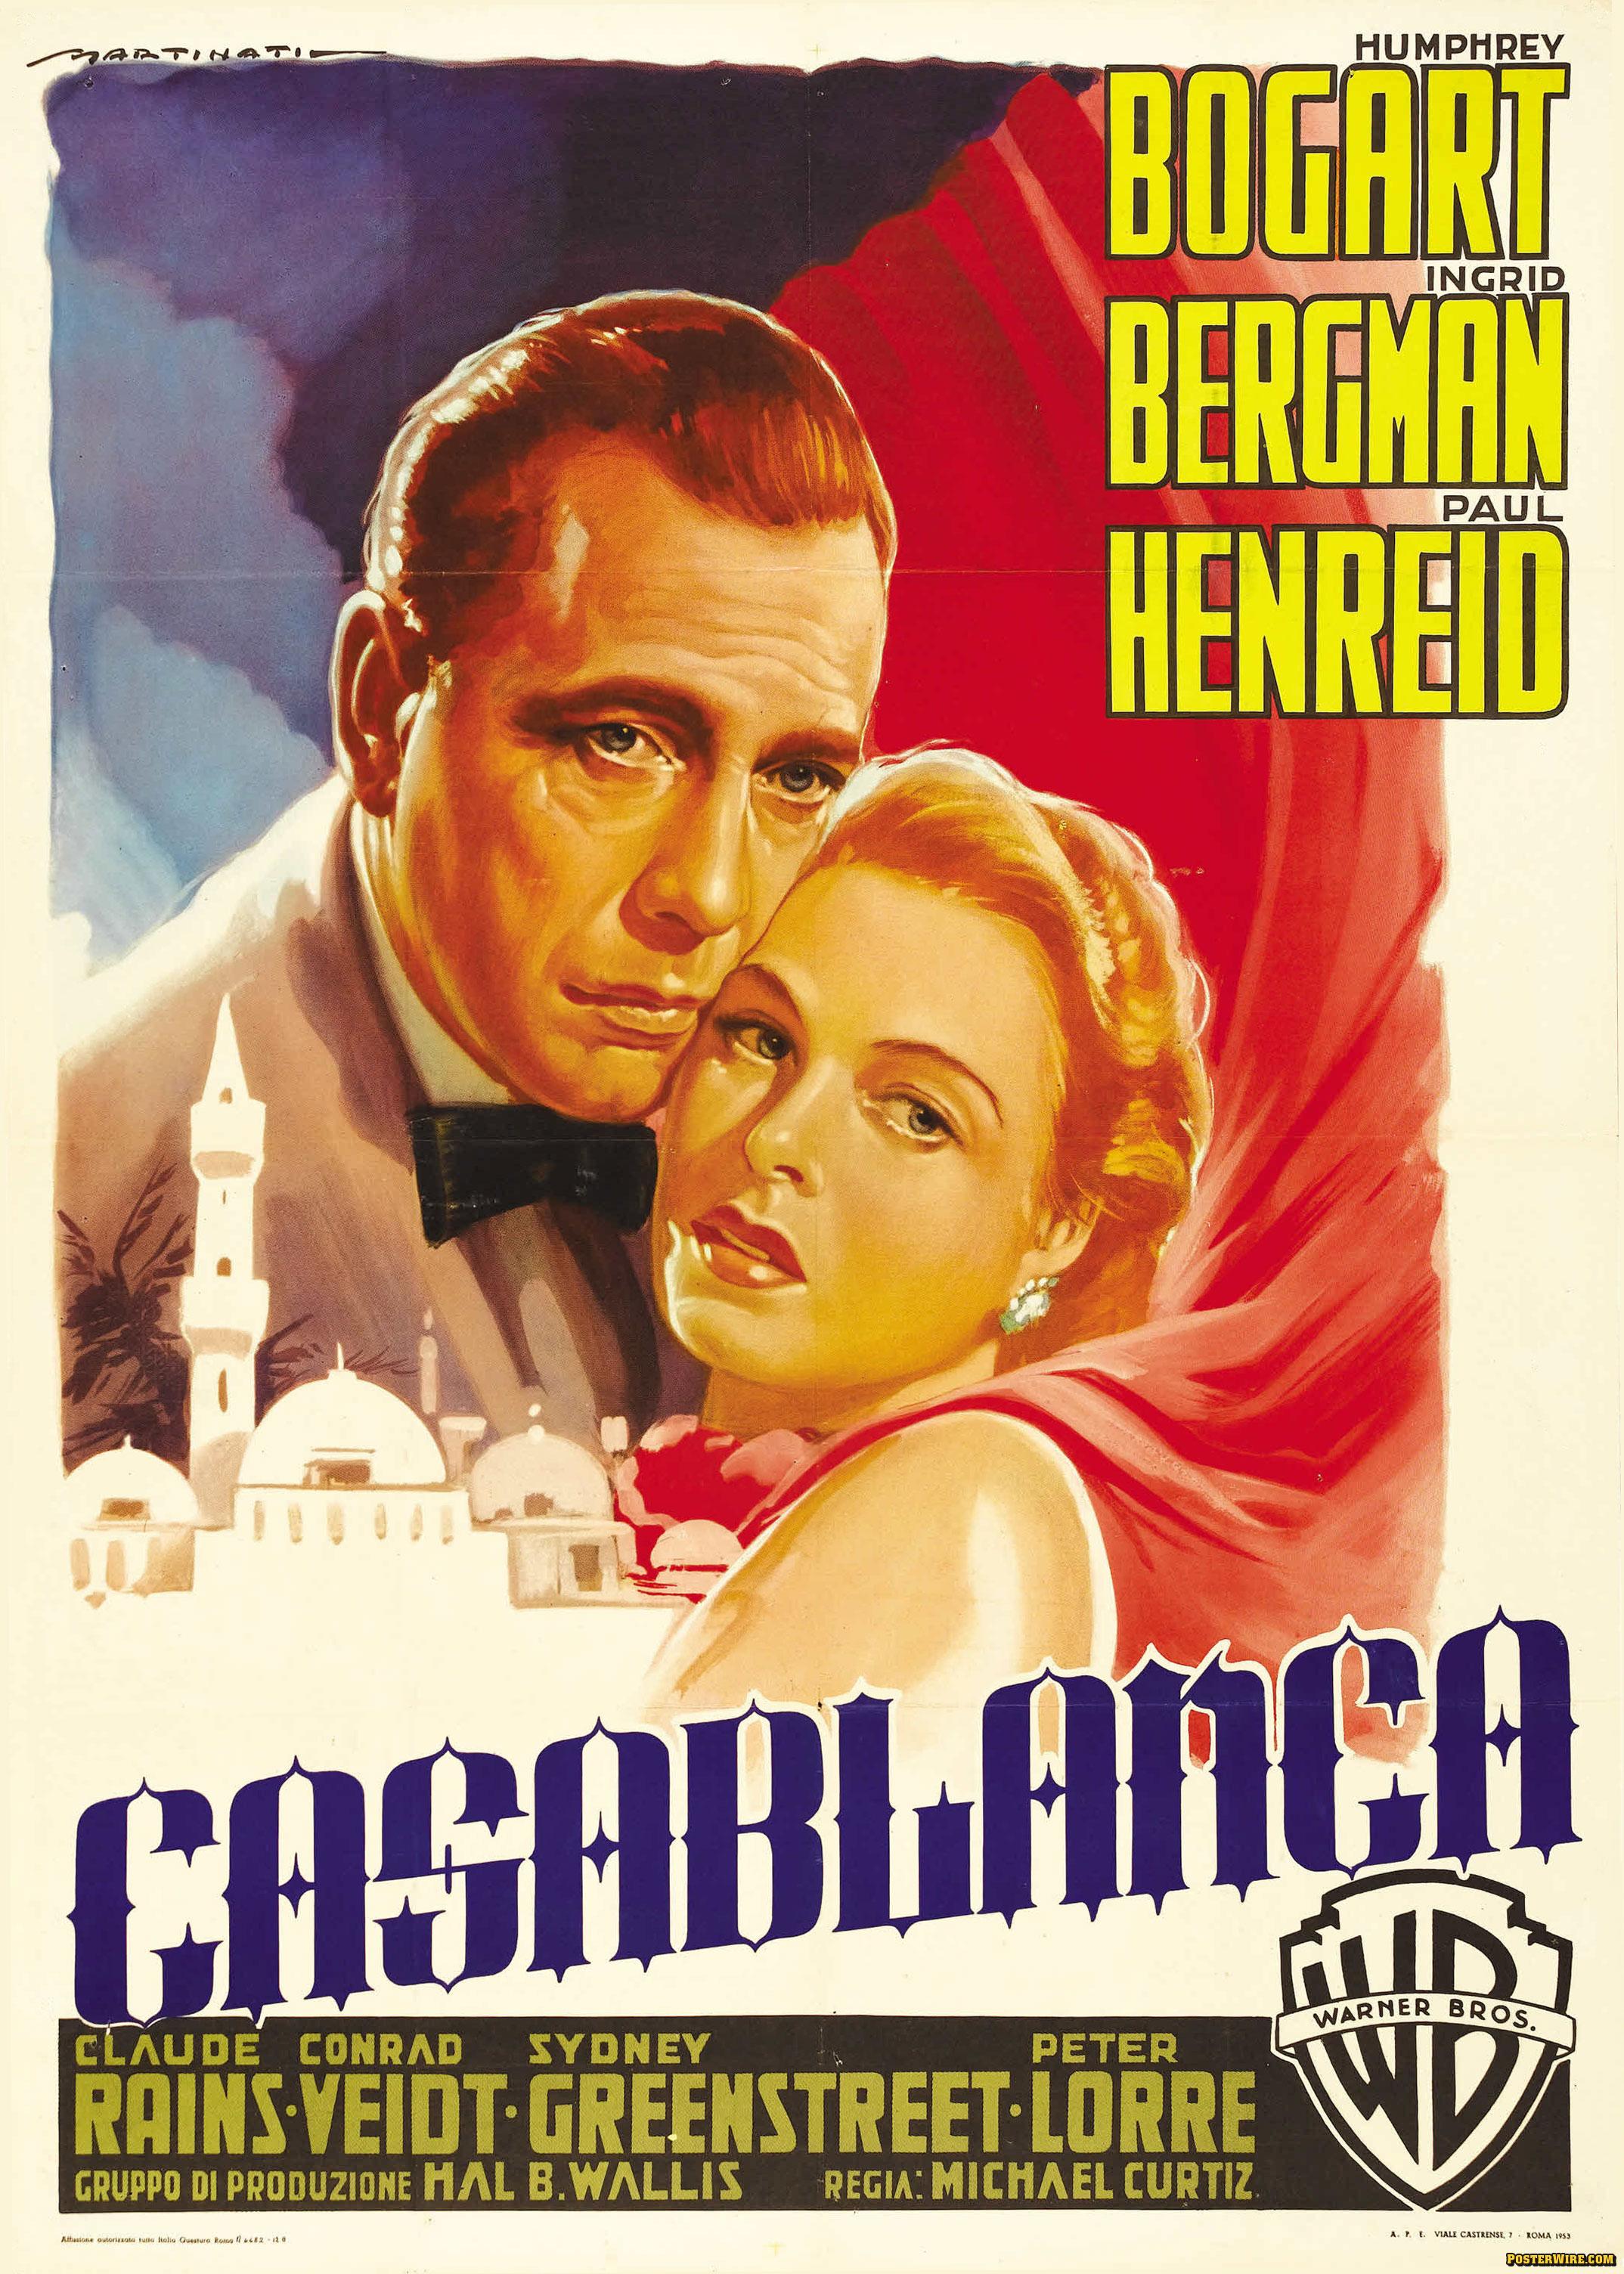 Casablanca V21 ⋆ Retro Movie PosterRetro Movie Poster